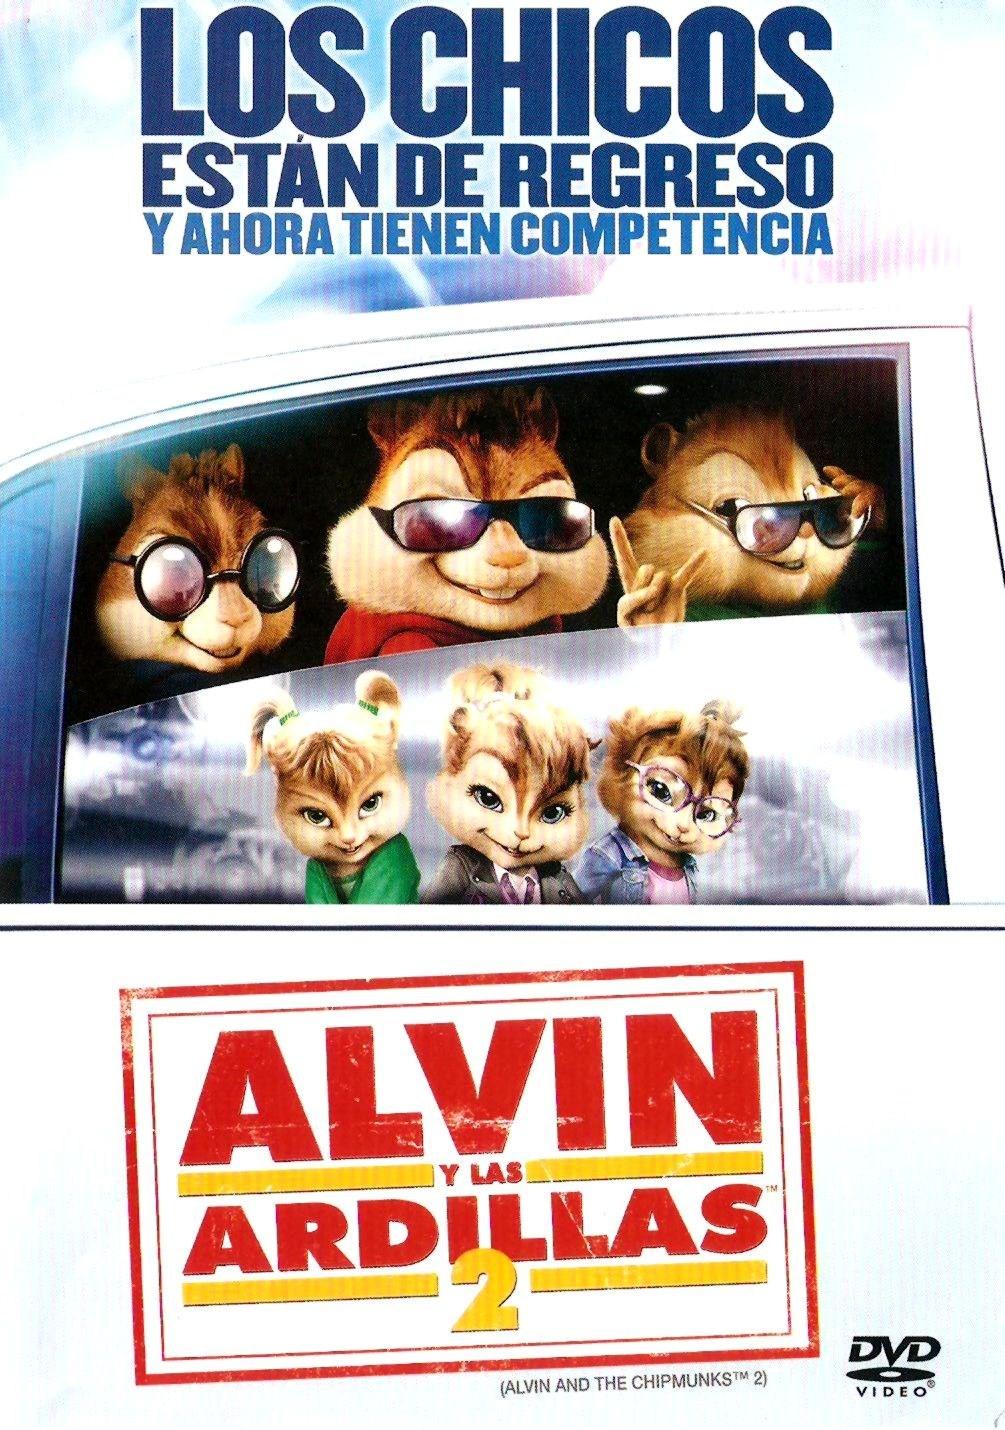 cinebahia: Alvin y las ardillas 2